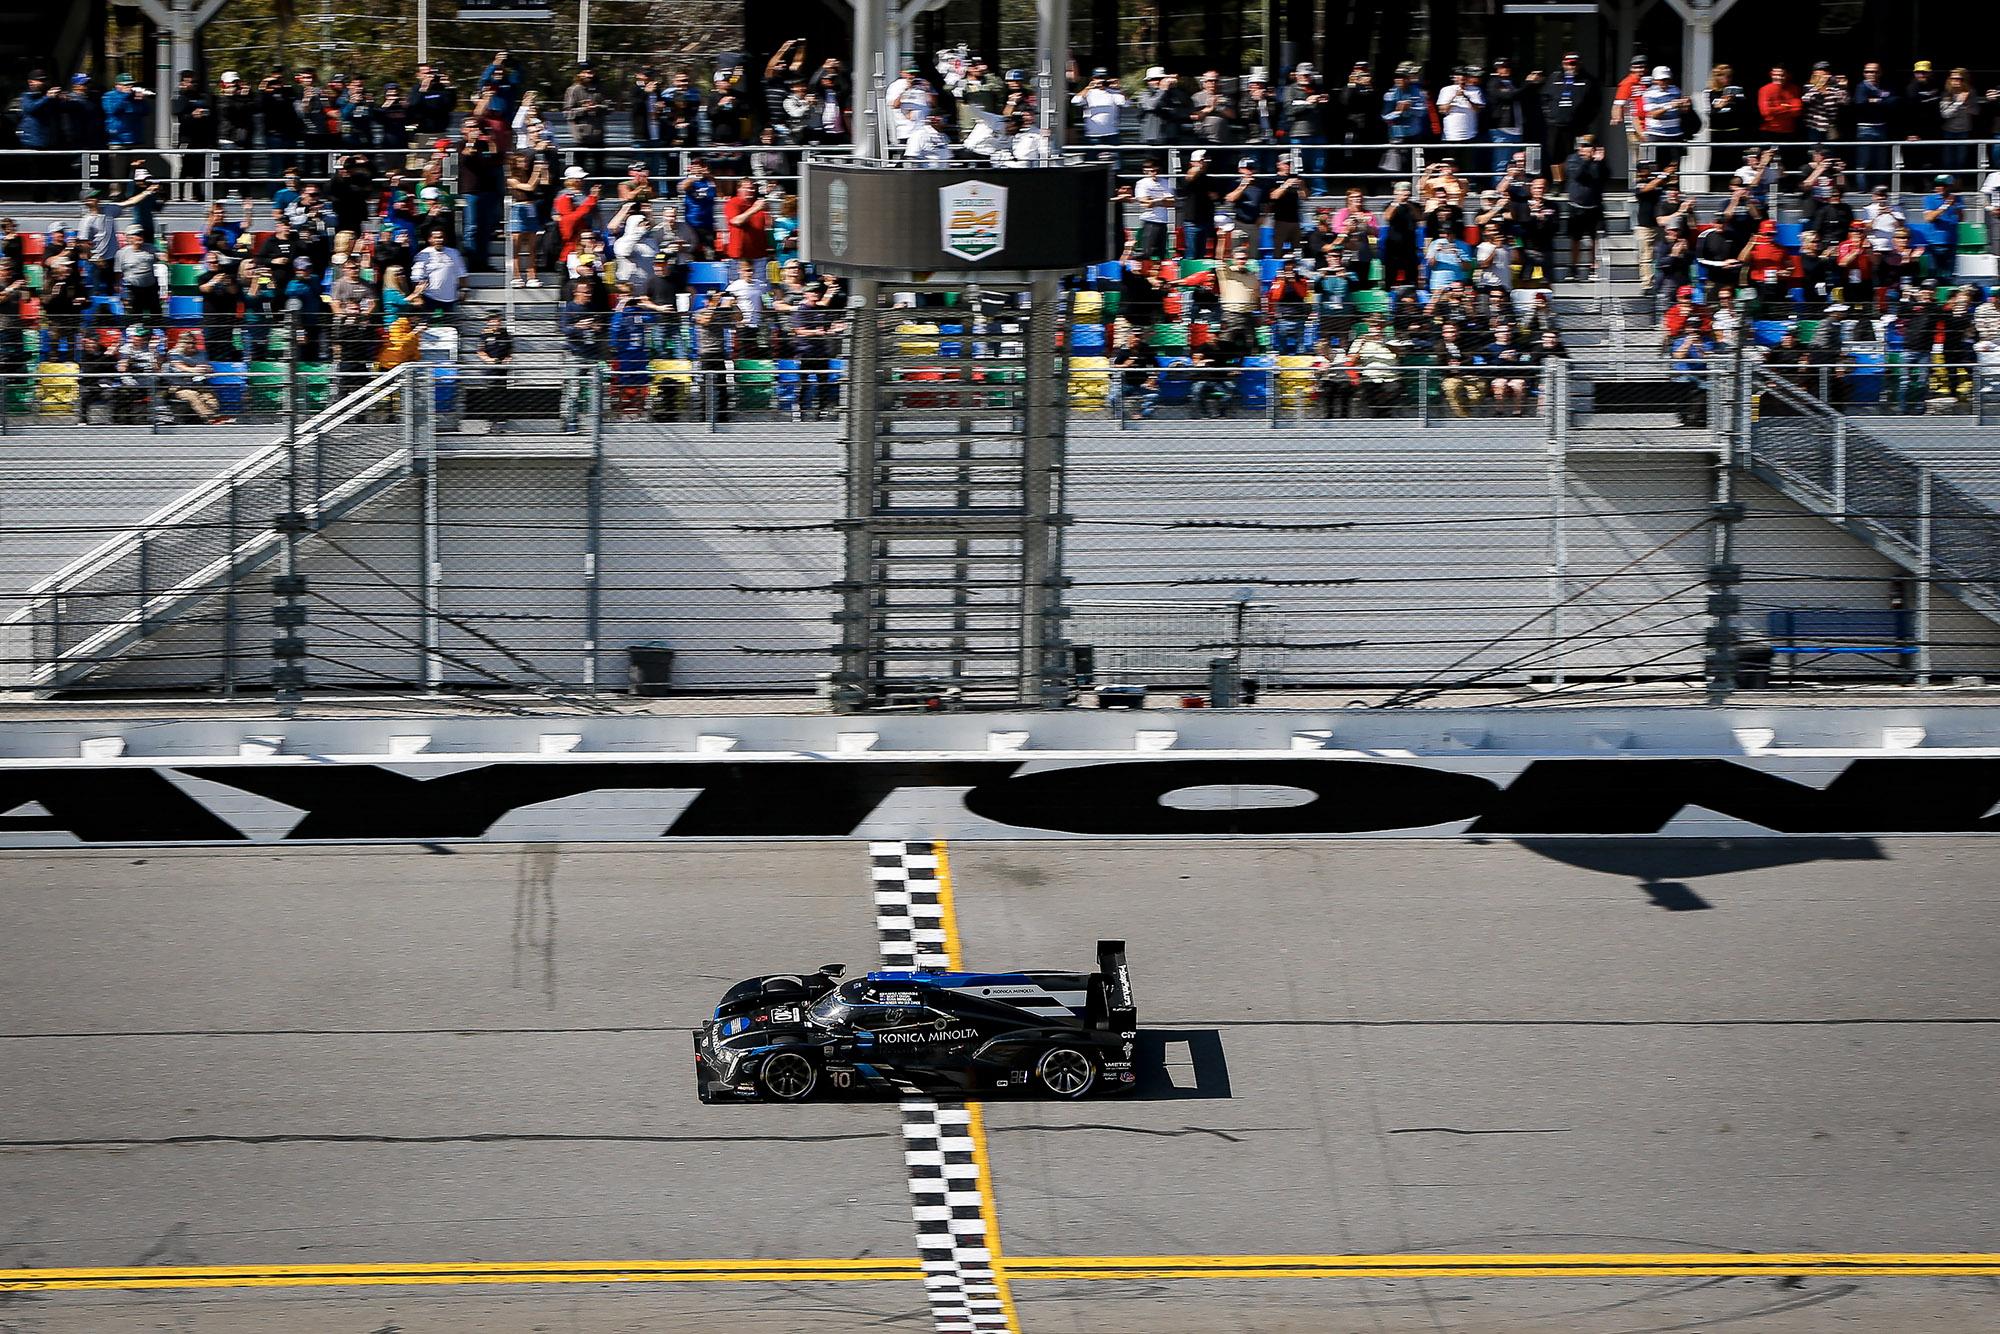 Kamui Kobayashi crosses the finish line to take victory in the 2020 Daytona 24 Hours